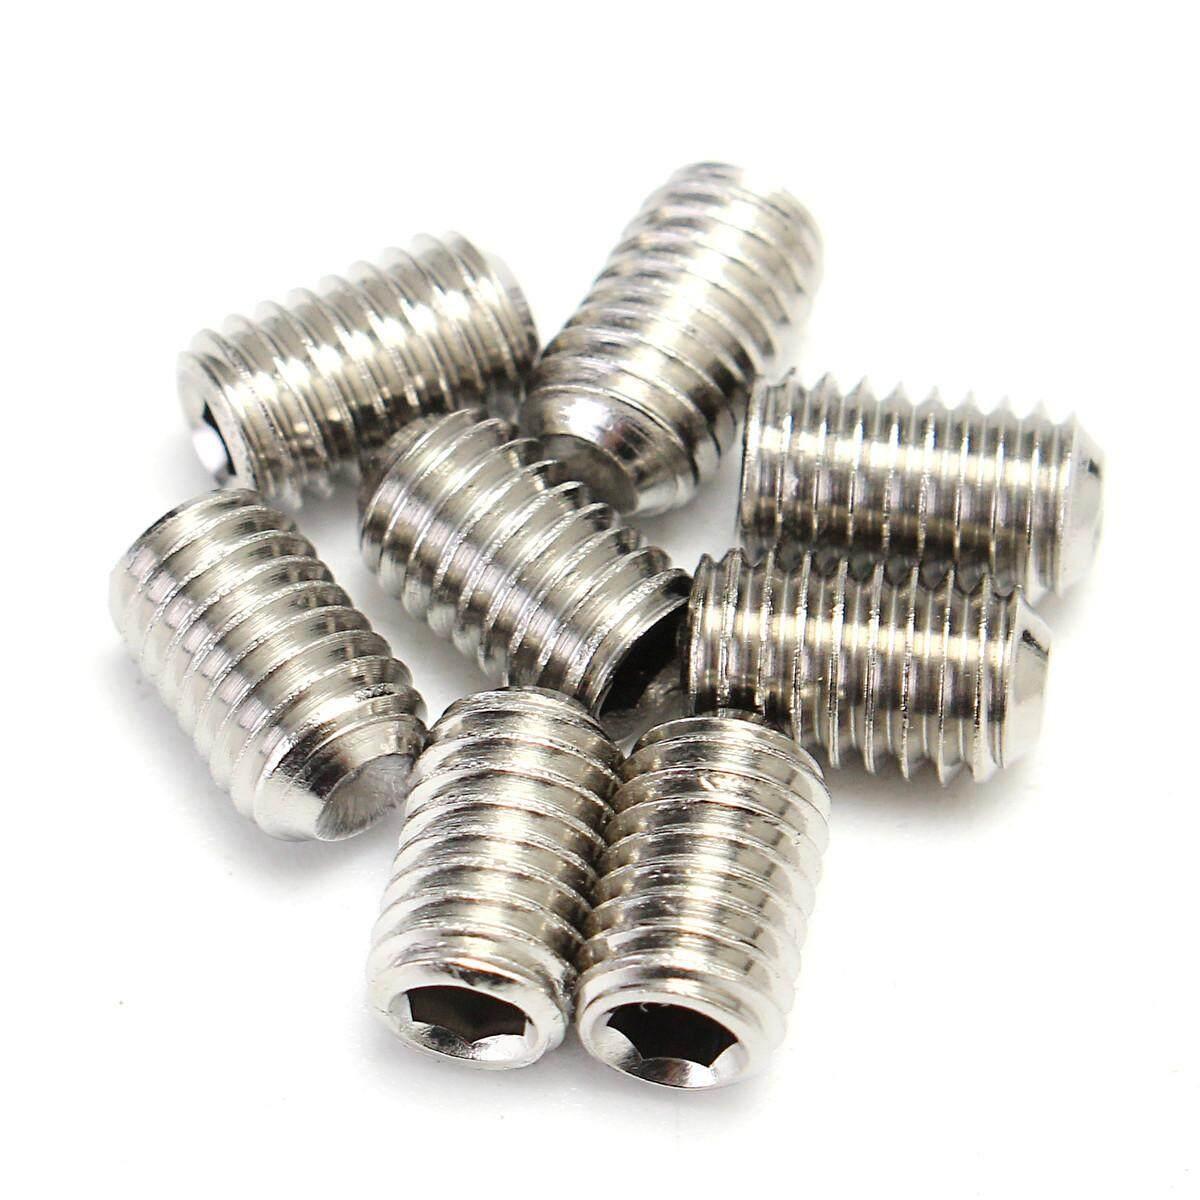 200Pcs M3 M4 M5 M6 M8 Stainless Steel Hex Socket Set Screws Assortment Kit + Box - intl - 2